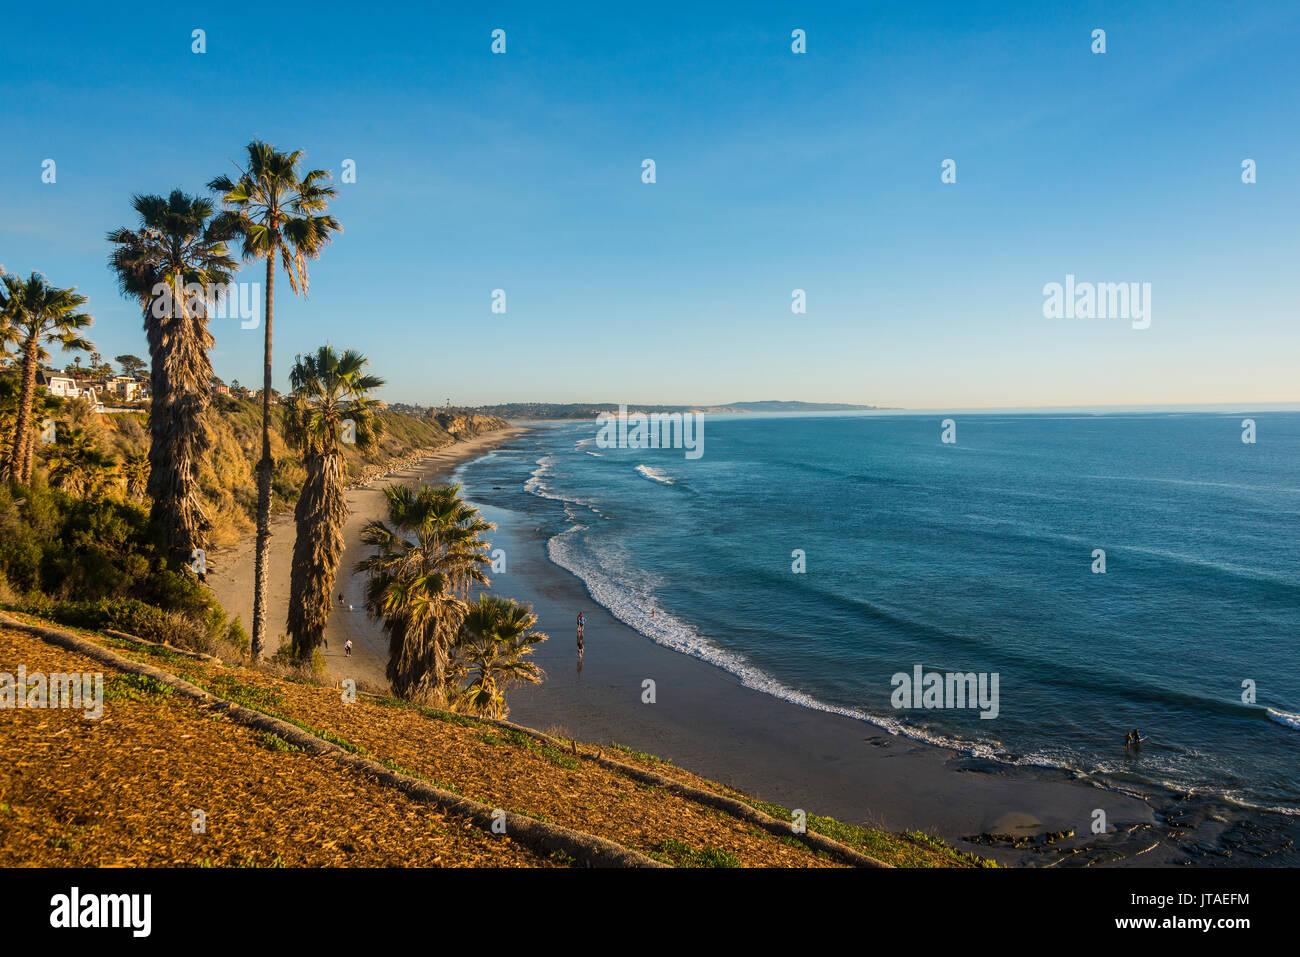 Cardiff, California, United States of America, North America - Stock Image